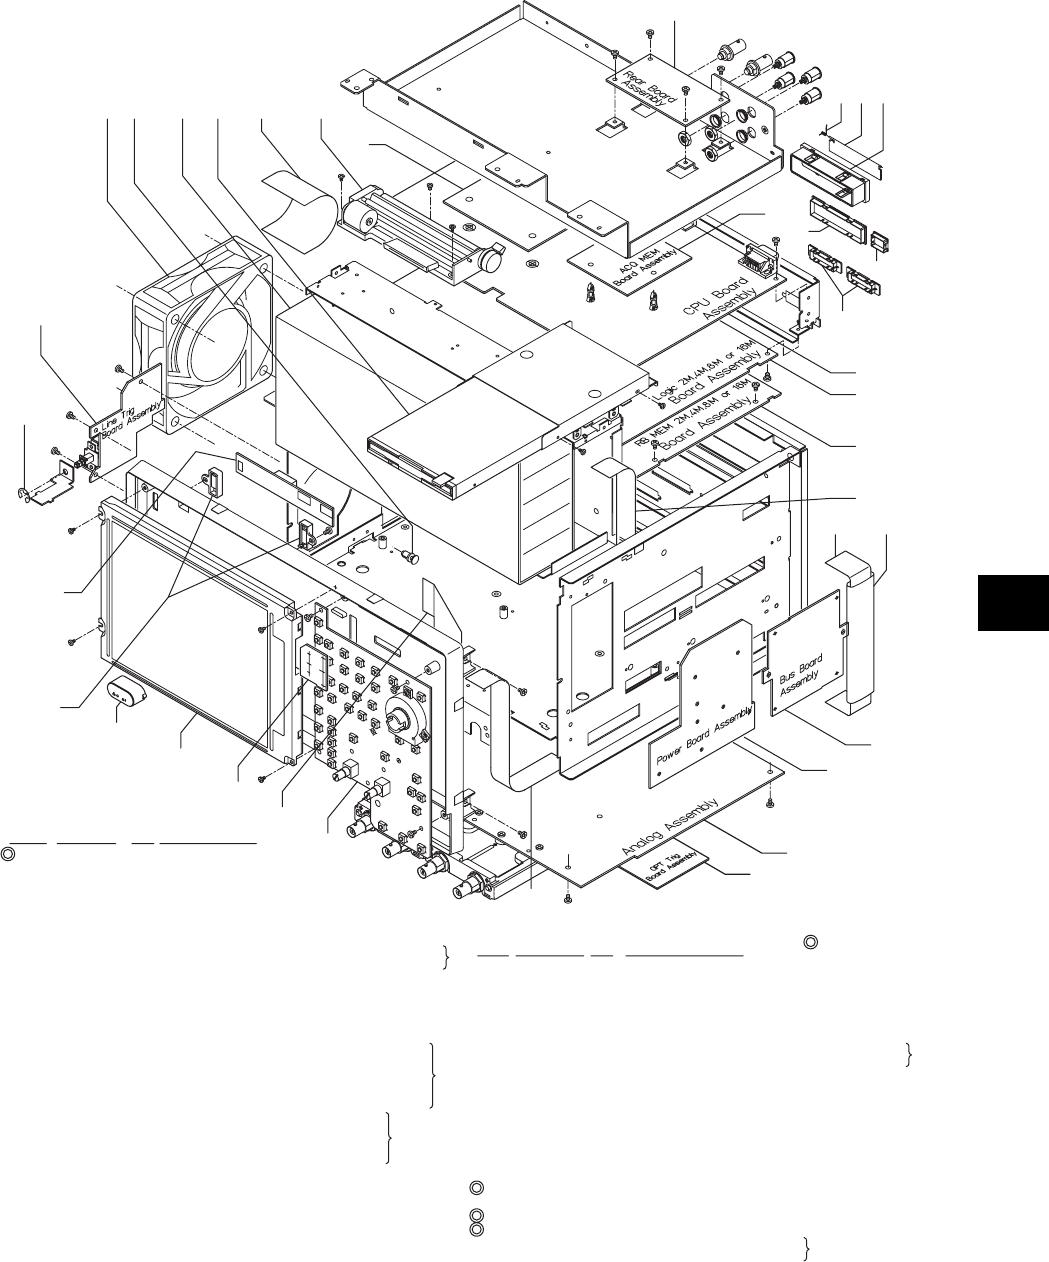 7014 dl7100 dl7200 digital oscilloscope yokogawa yokogawa Multimeter Diagram 7 3